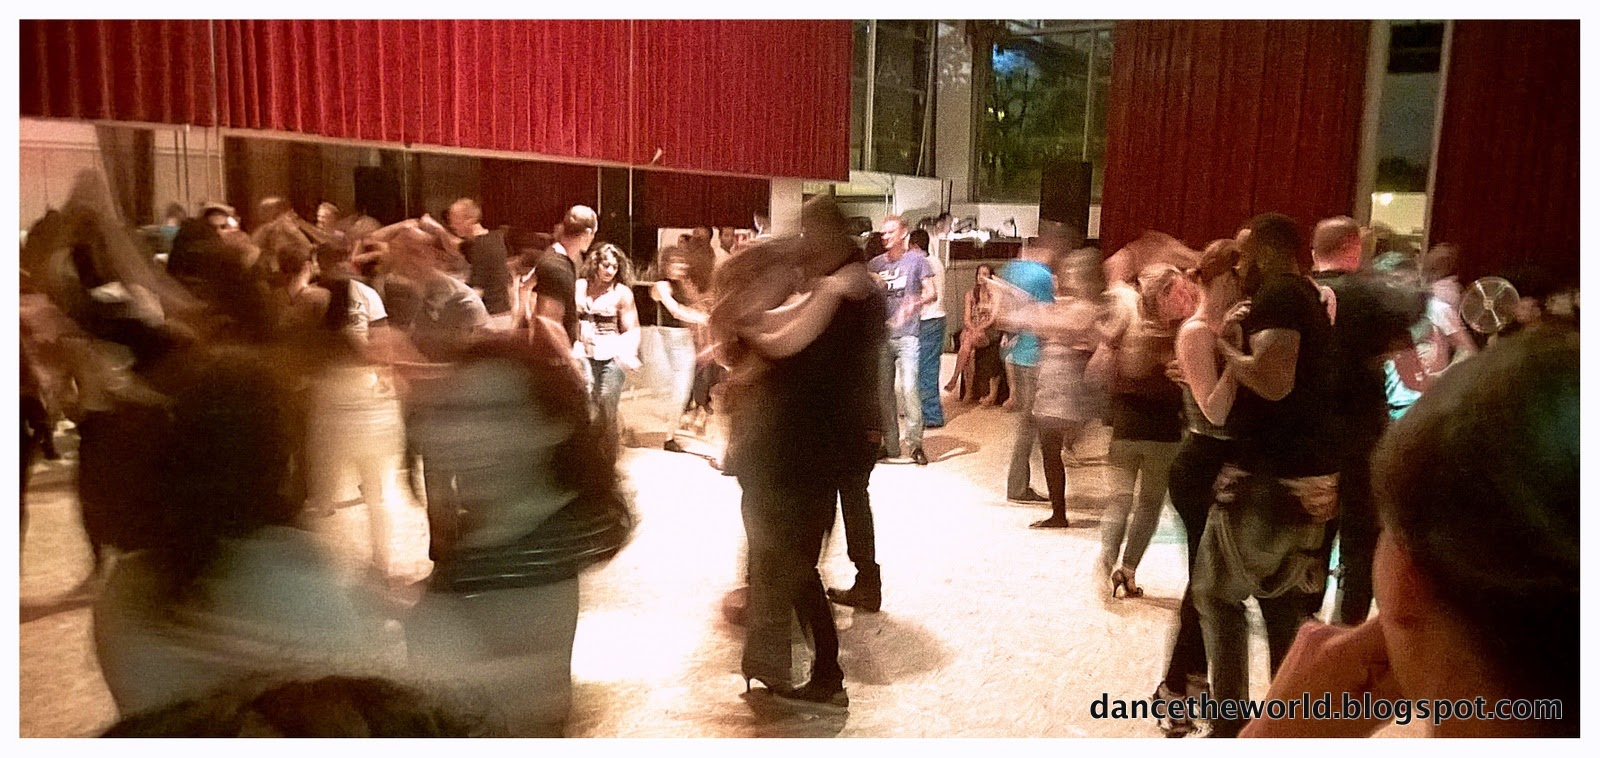 Zouk dancers at the BraSaZouk's Copacabana Night